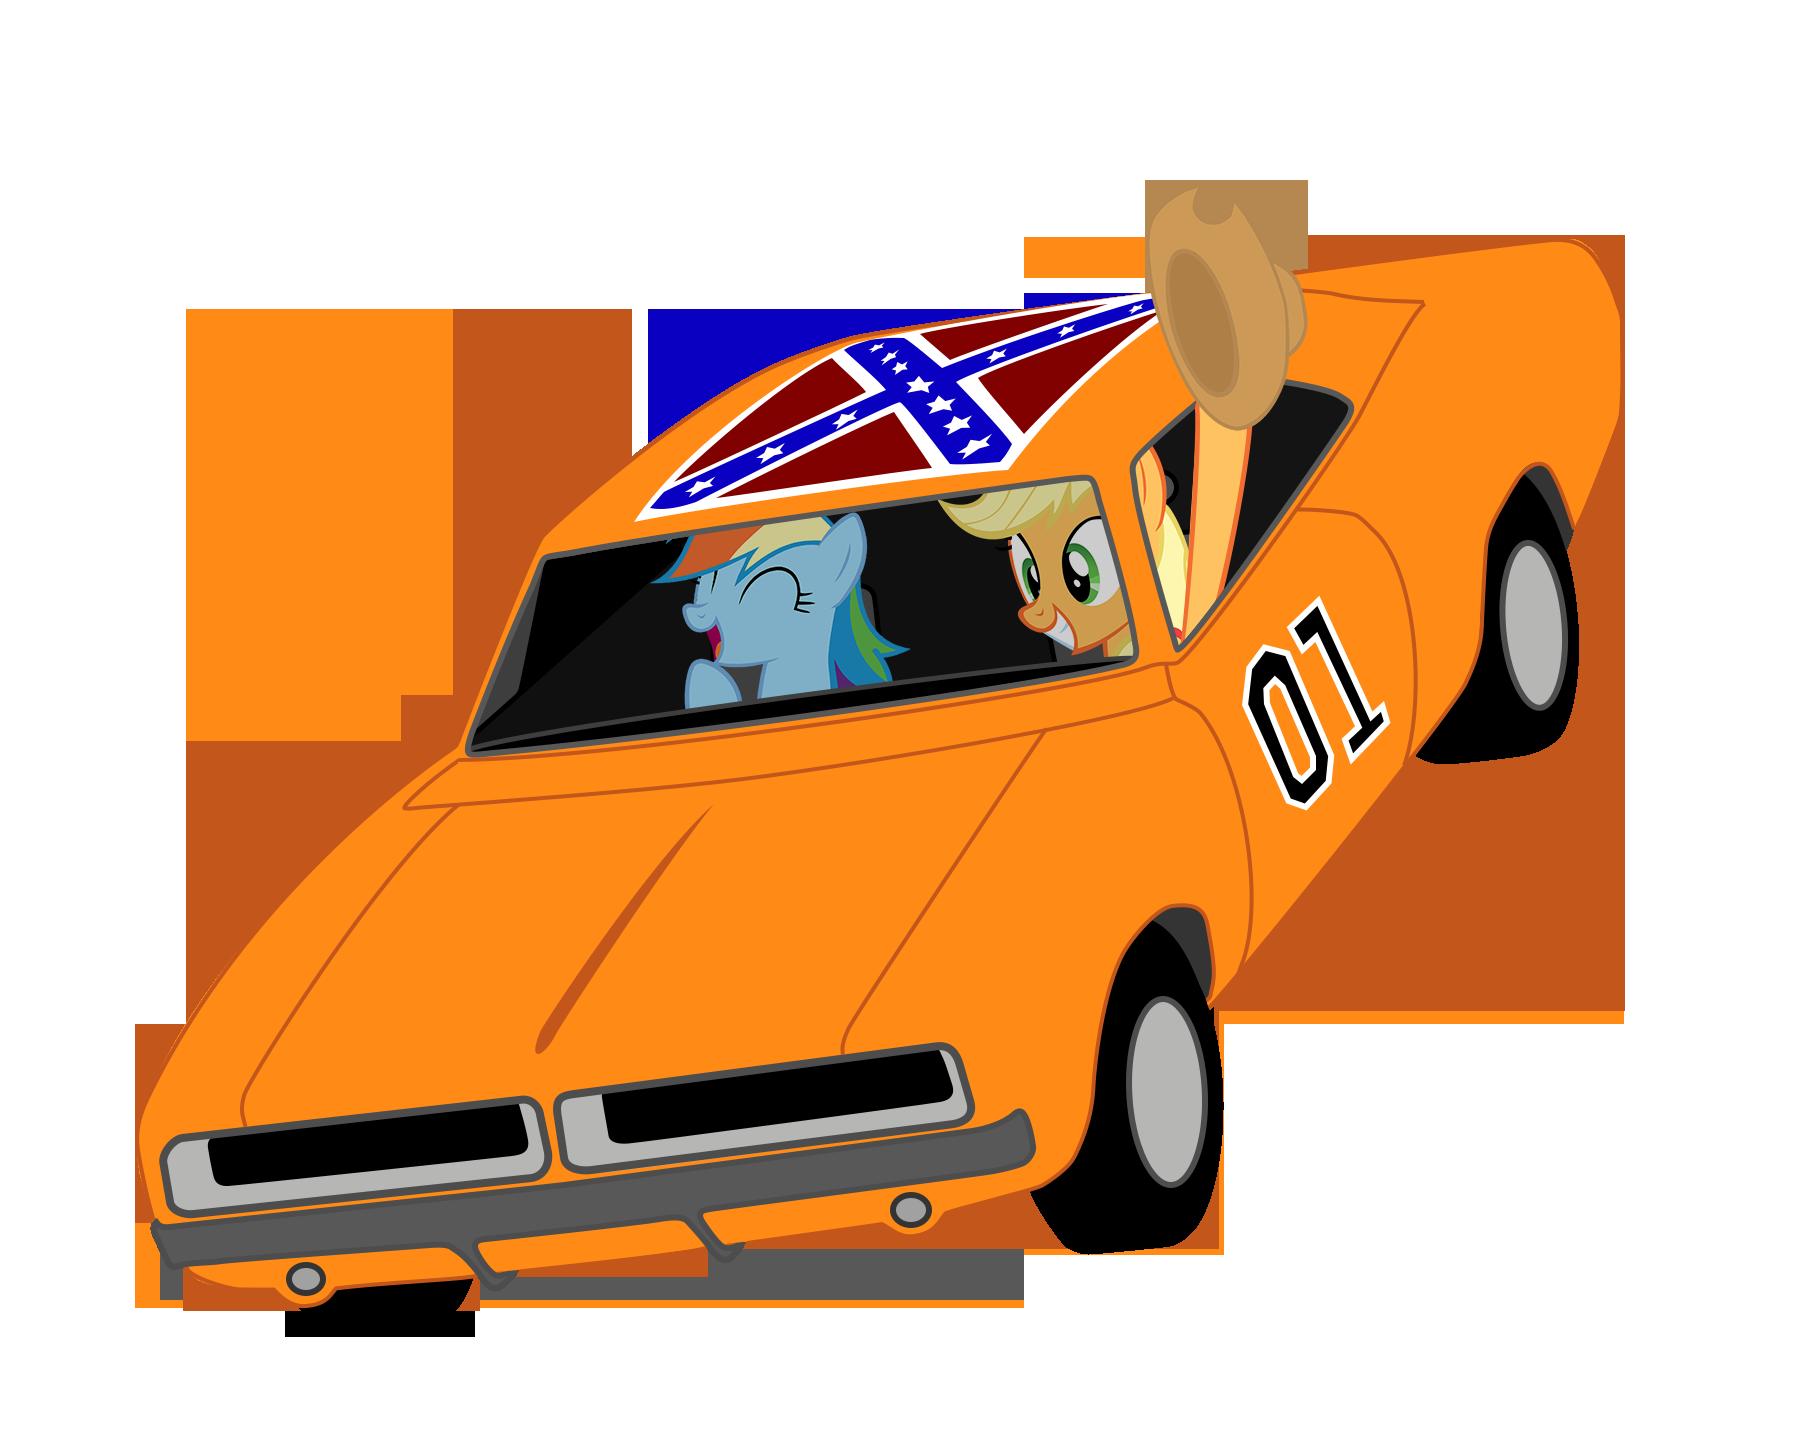 #986843 - airborne, applejack, artist:9x18, car ...